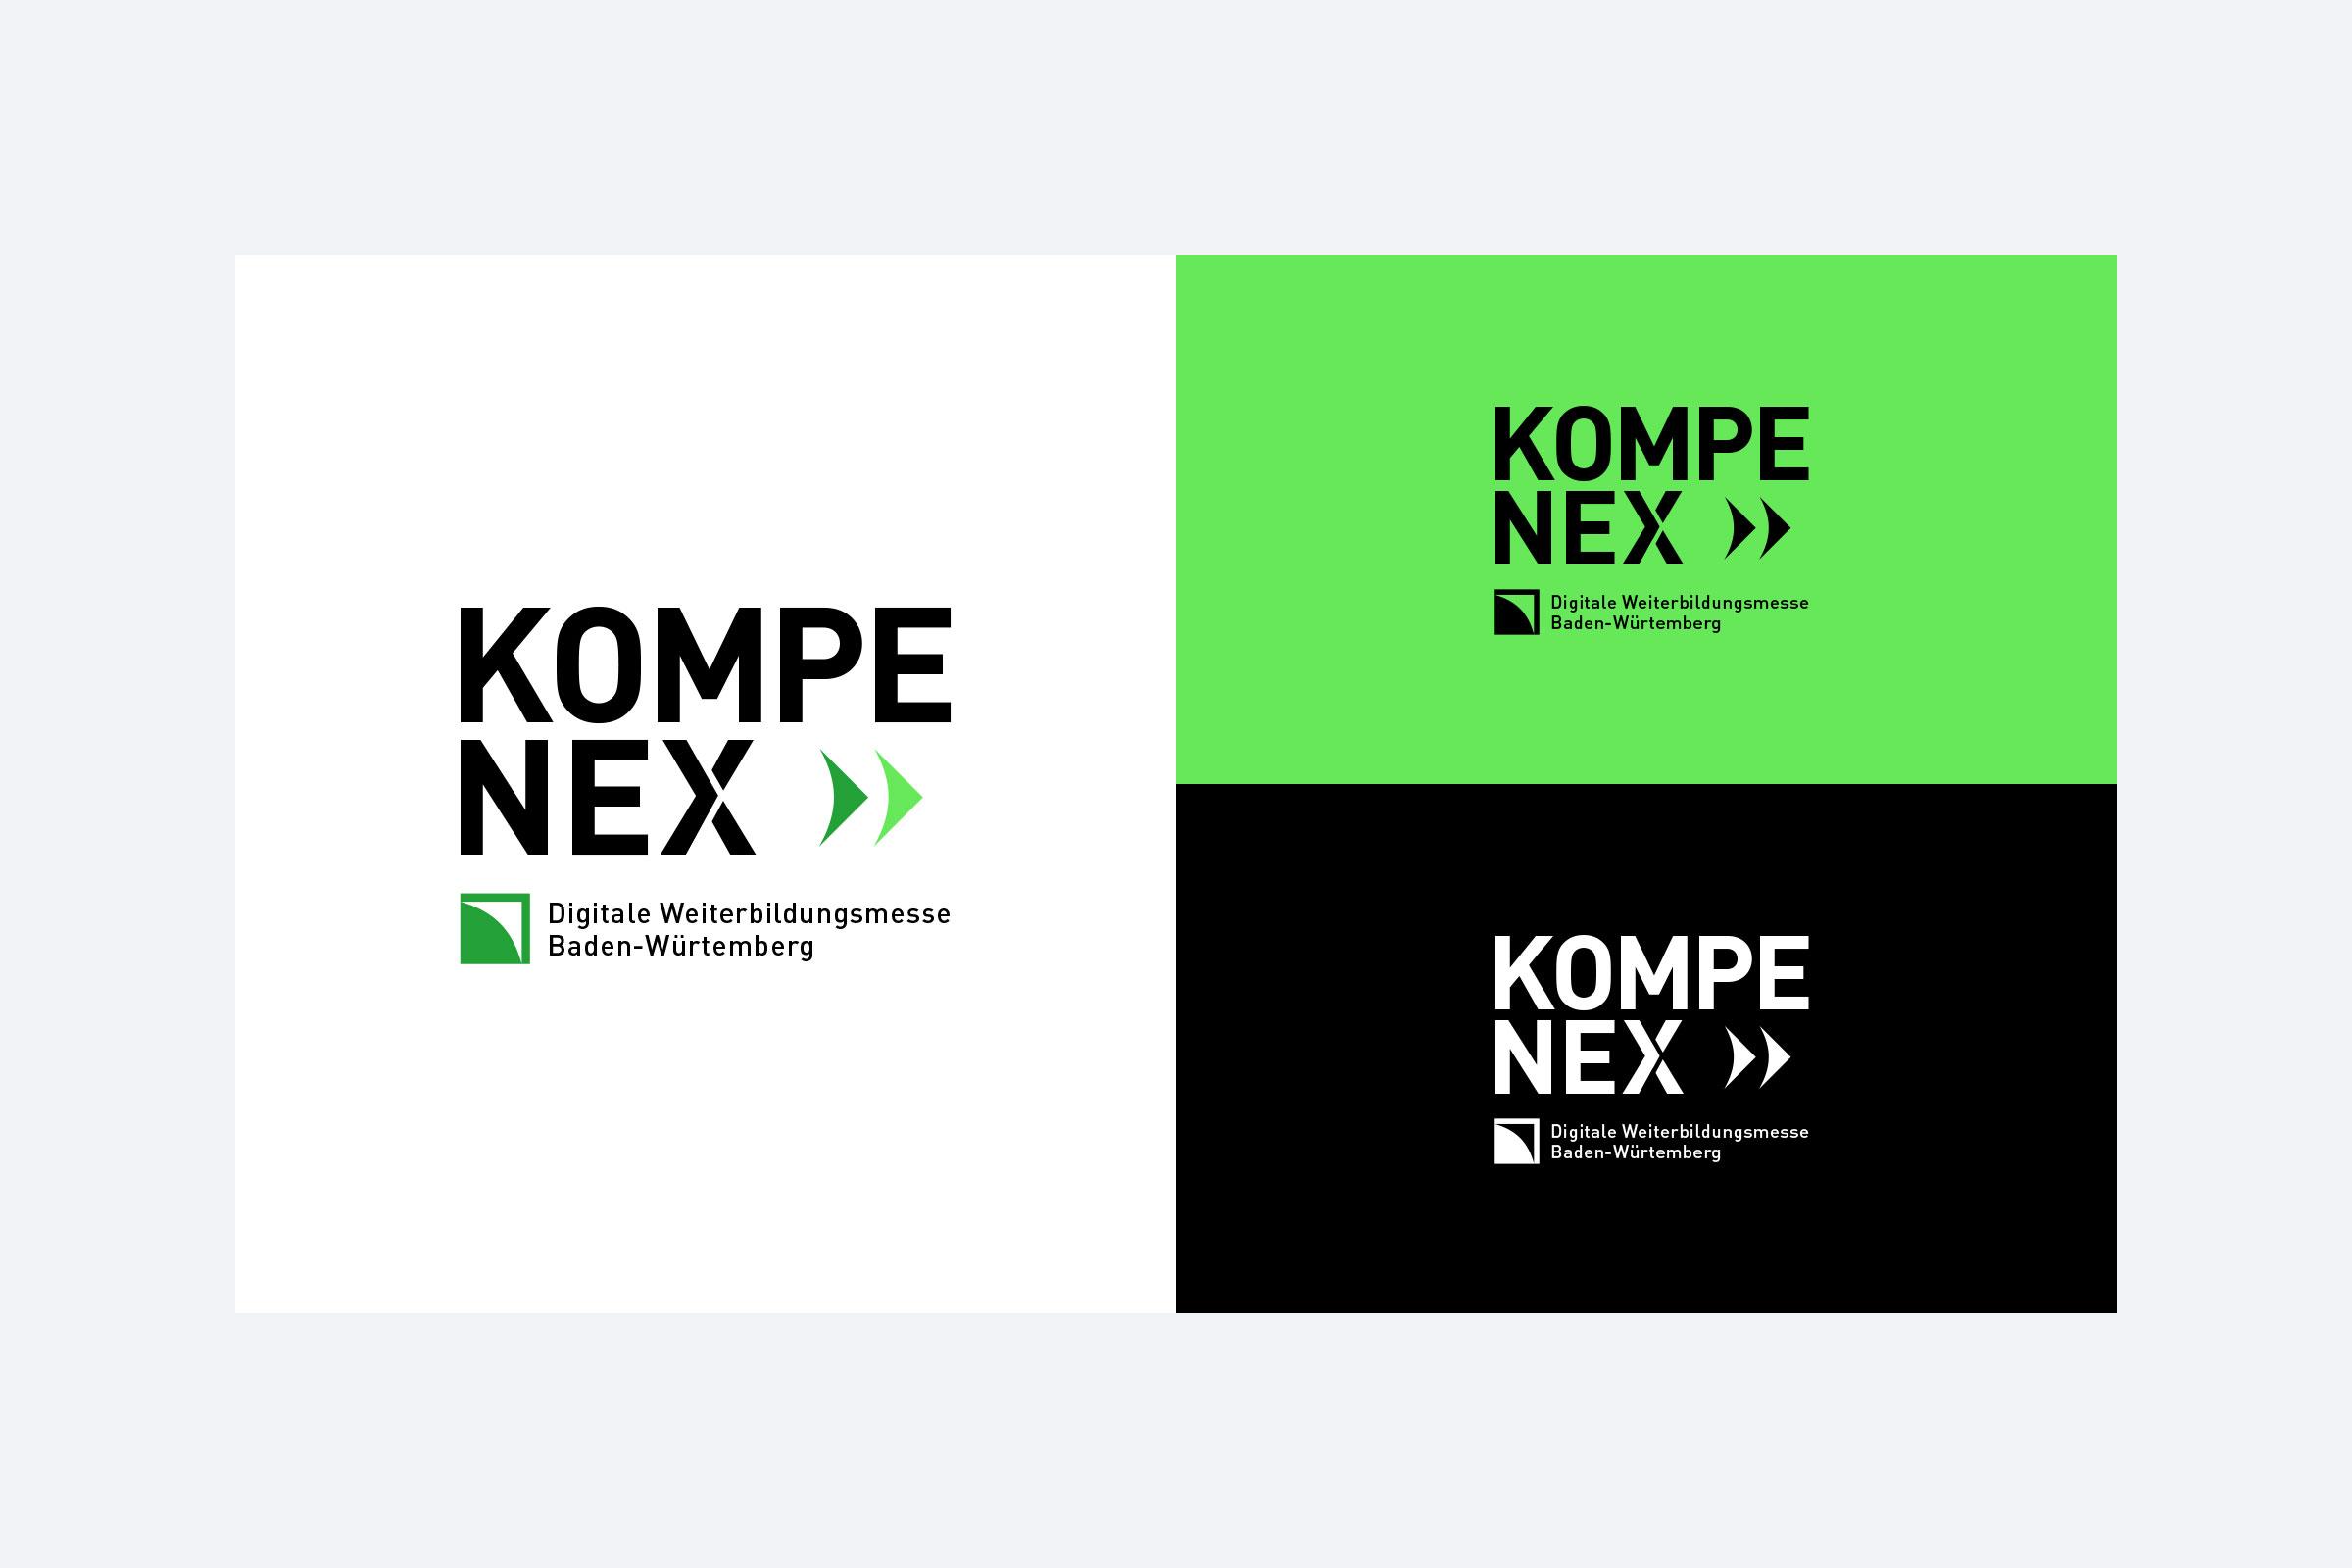 Kompenex_2